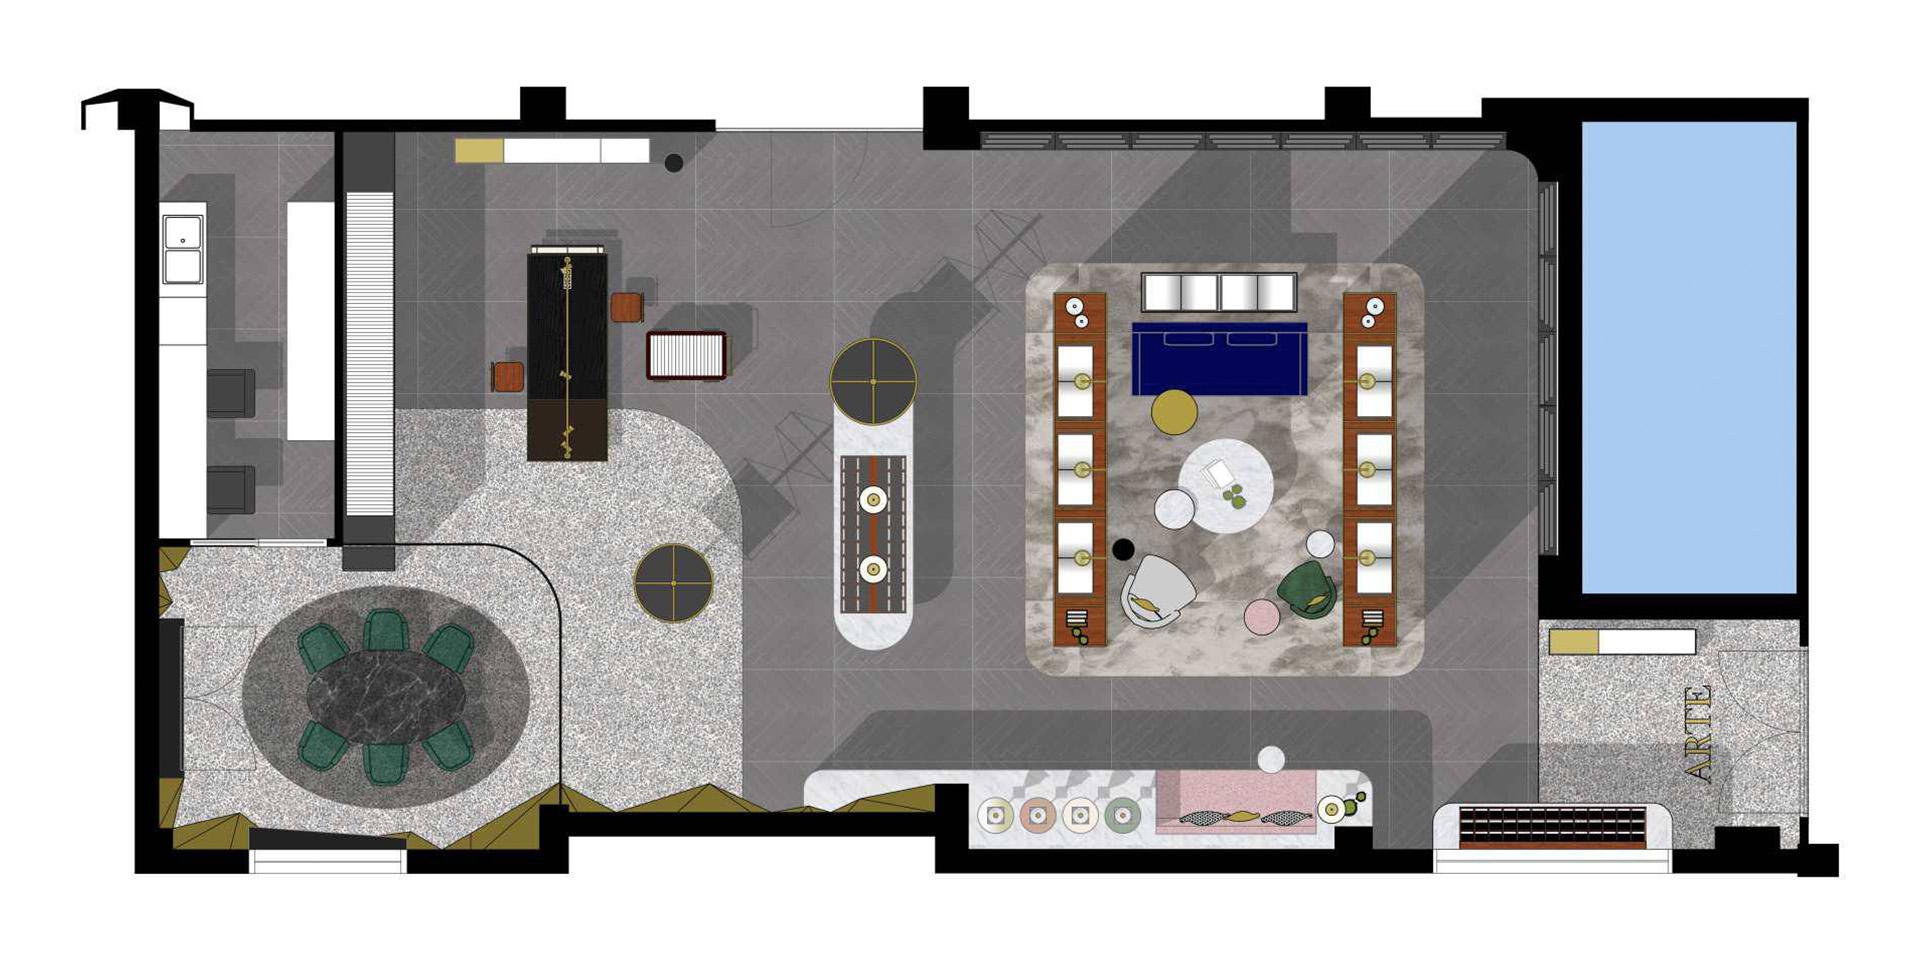 Creneau Interior Design Agency Dubai Middle East Arte Interior Coloured Plan